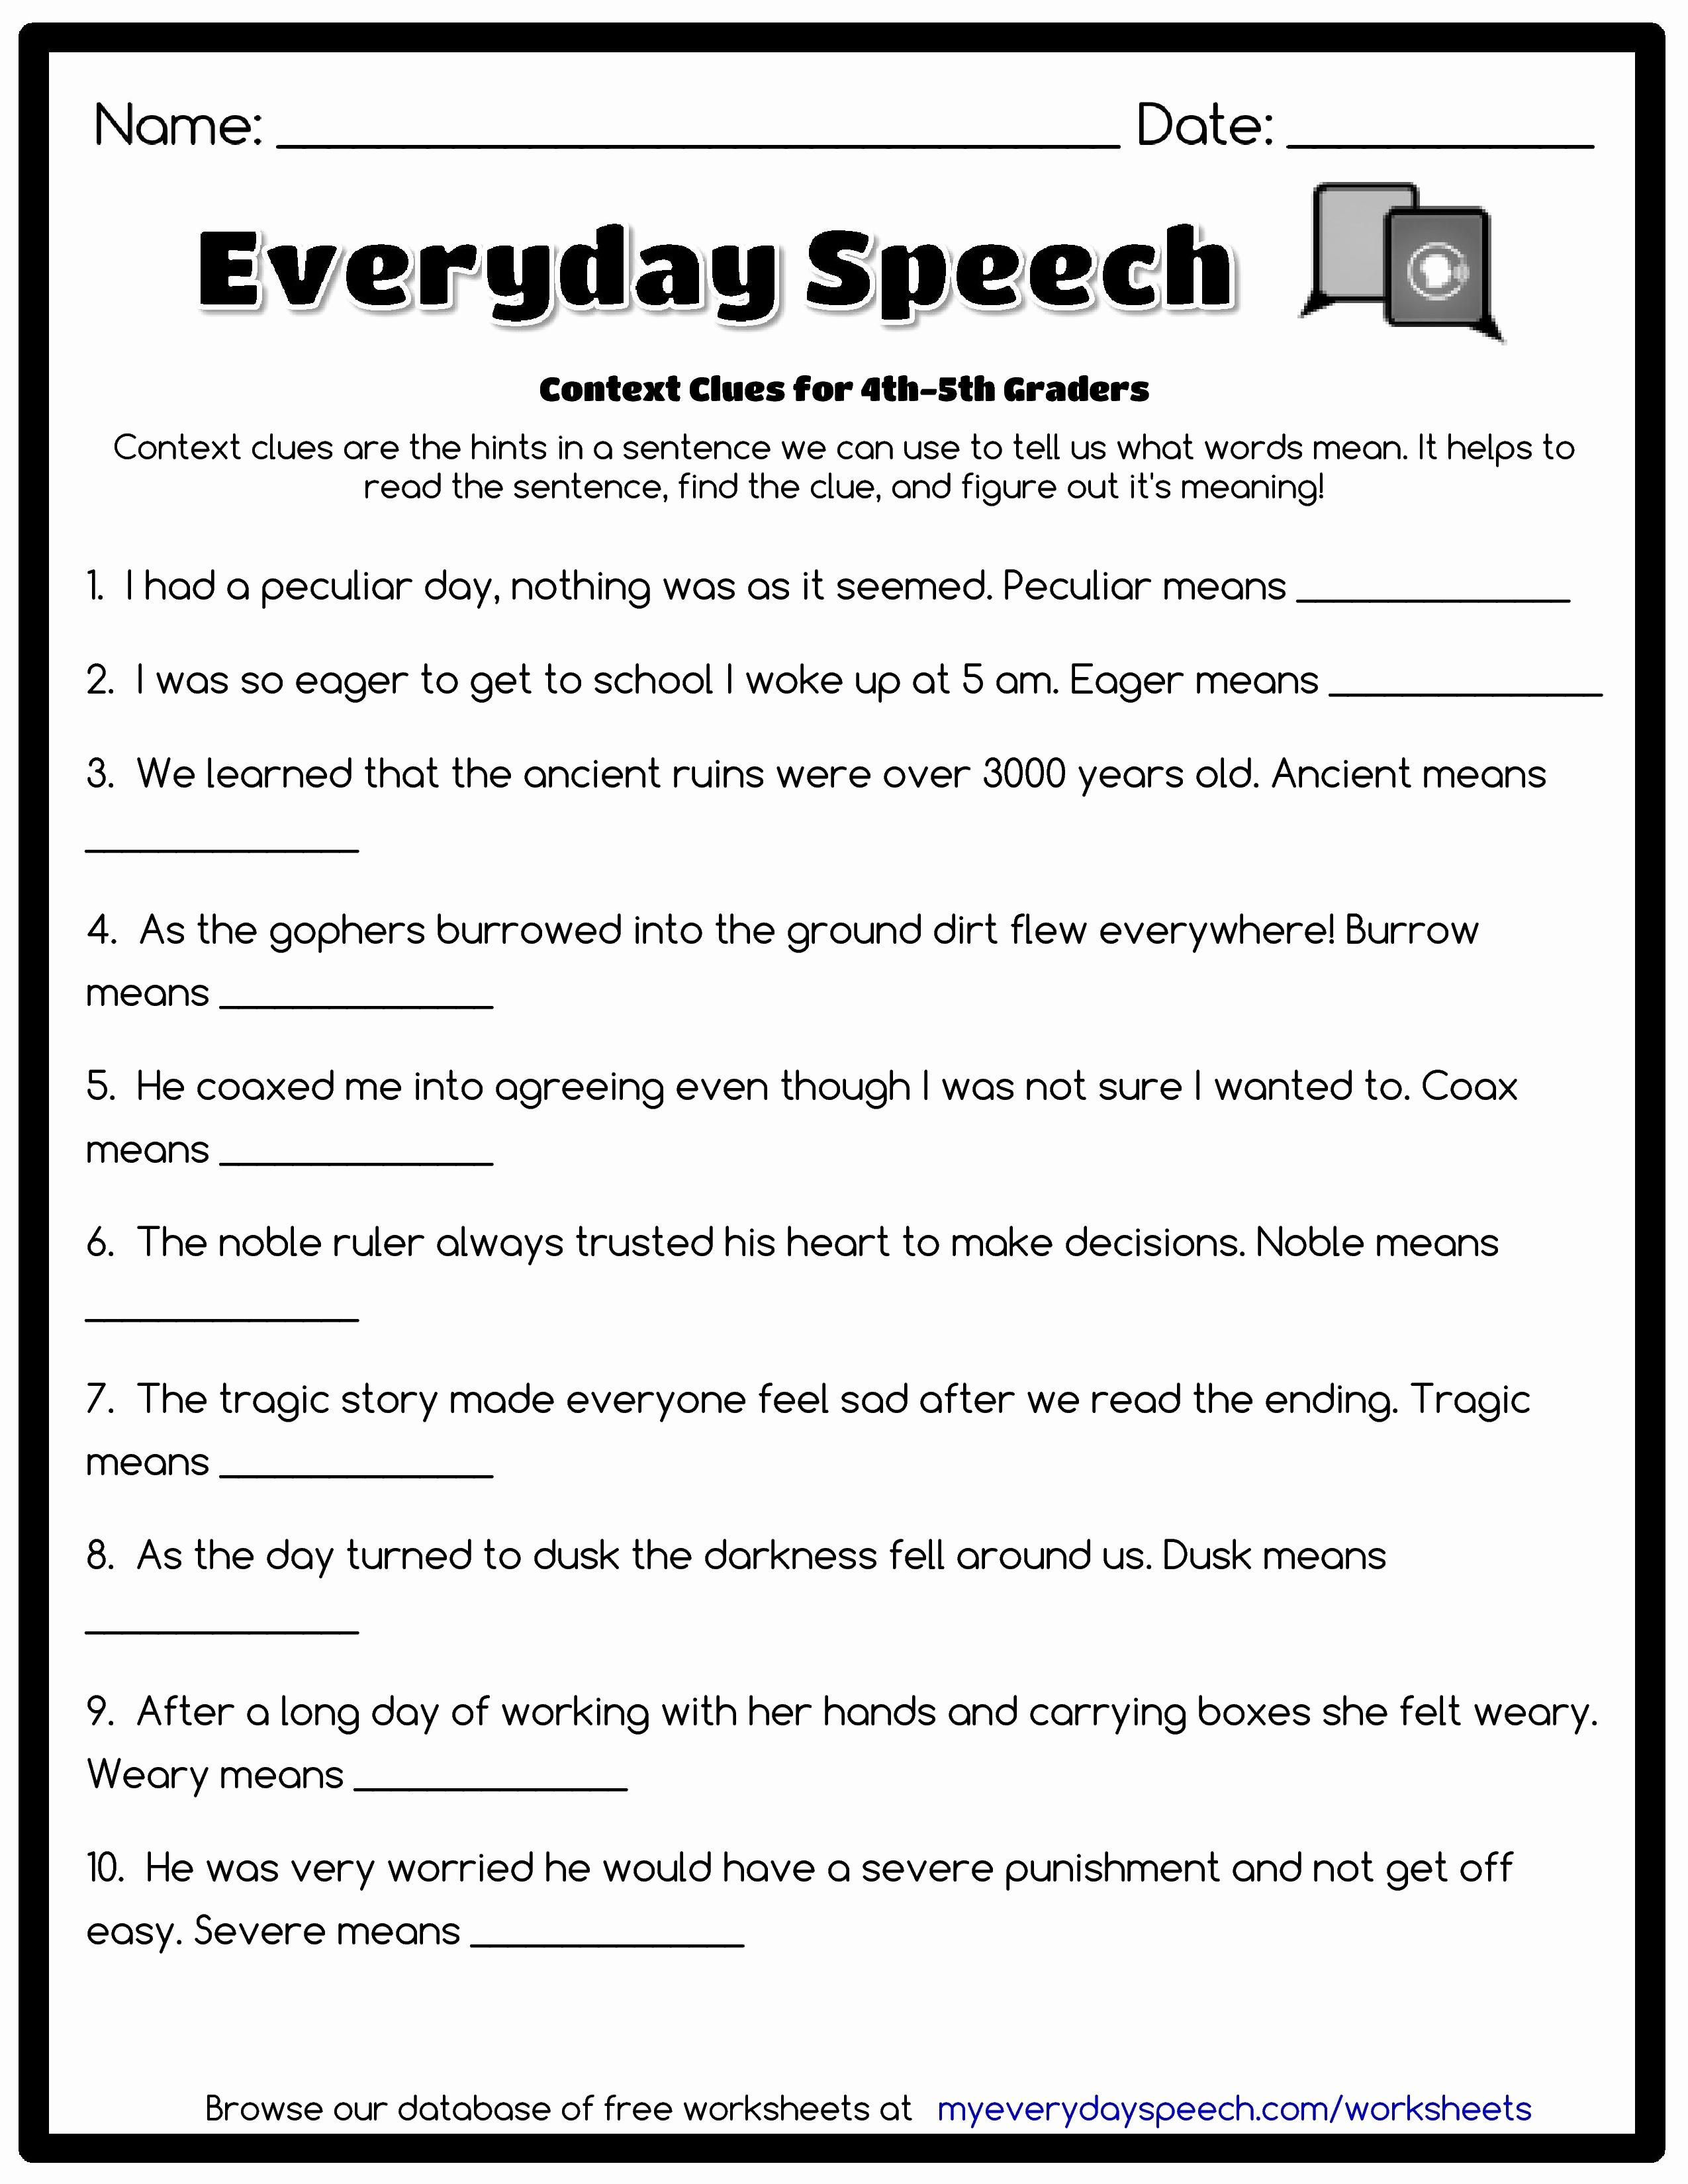 Grammar Worksheets Third Grade To Education - Math Worksheet For | Free Printable Third Grade Grammar Worksheets